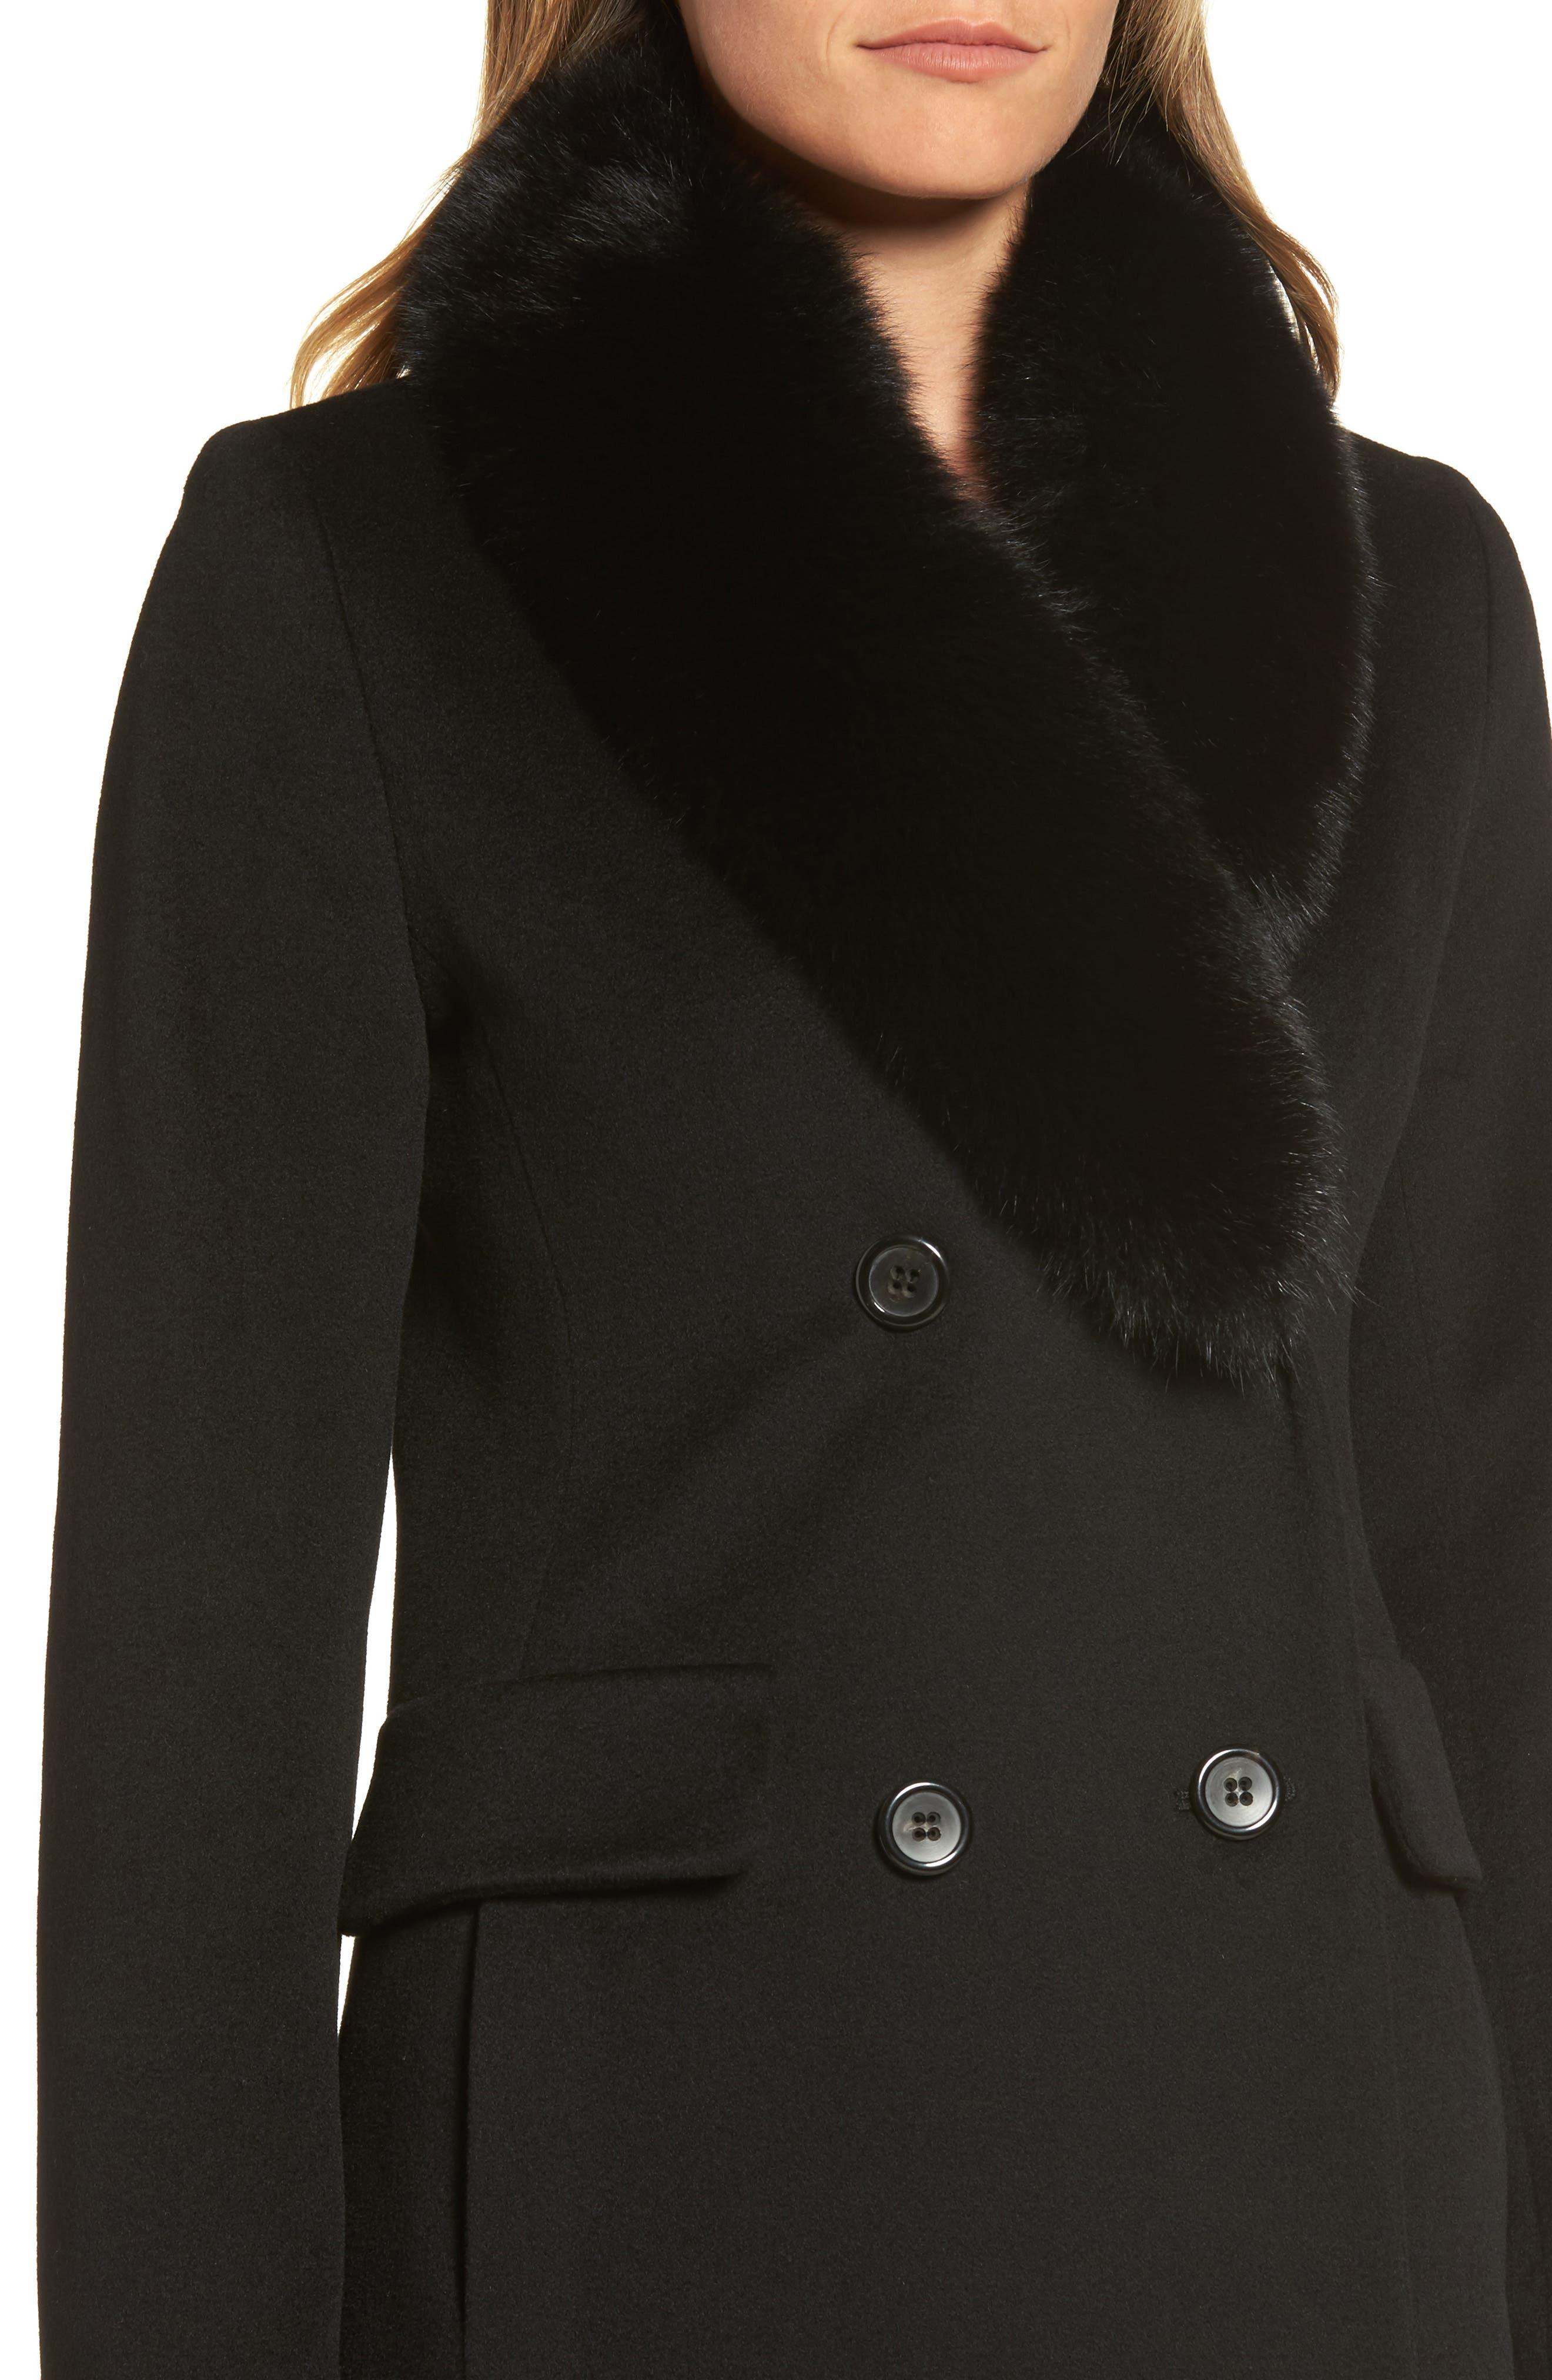 Alternate Image 4  - Fleurette Loro Piana Wool Coat with Genuine Fox Fur Collar